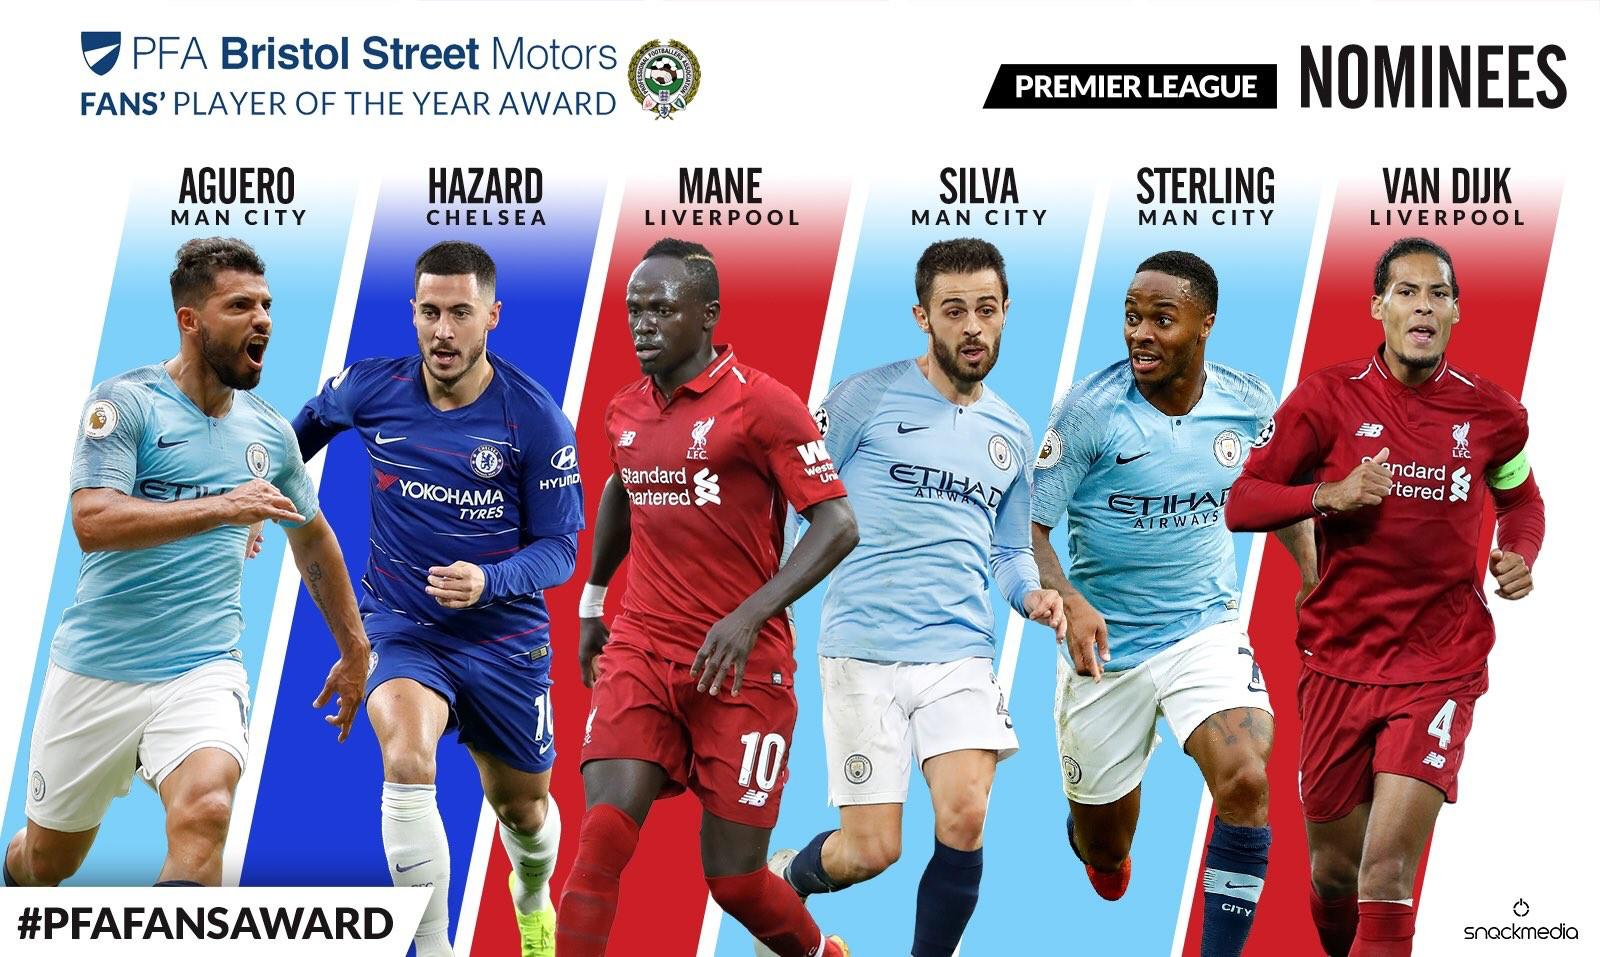 PFA球迷票选最佳球员候选:曼城、利物浦占五席,阿扎尔入围